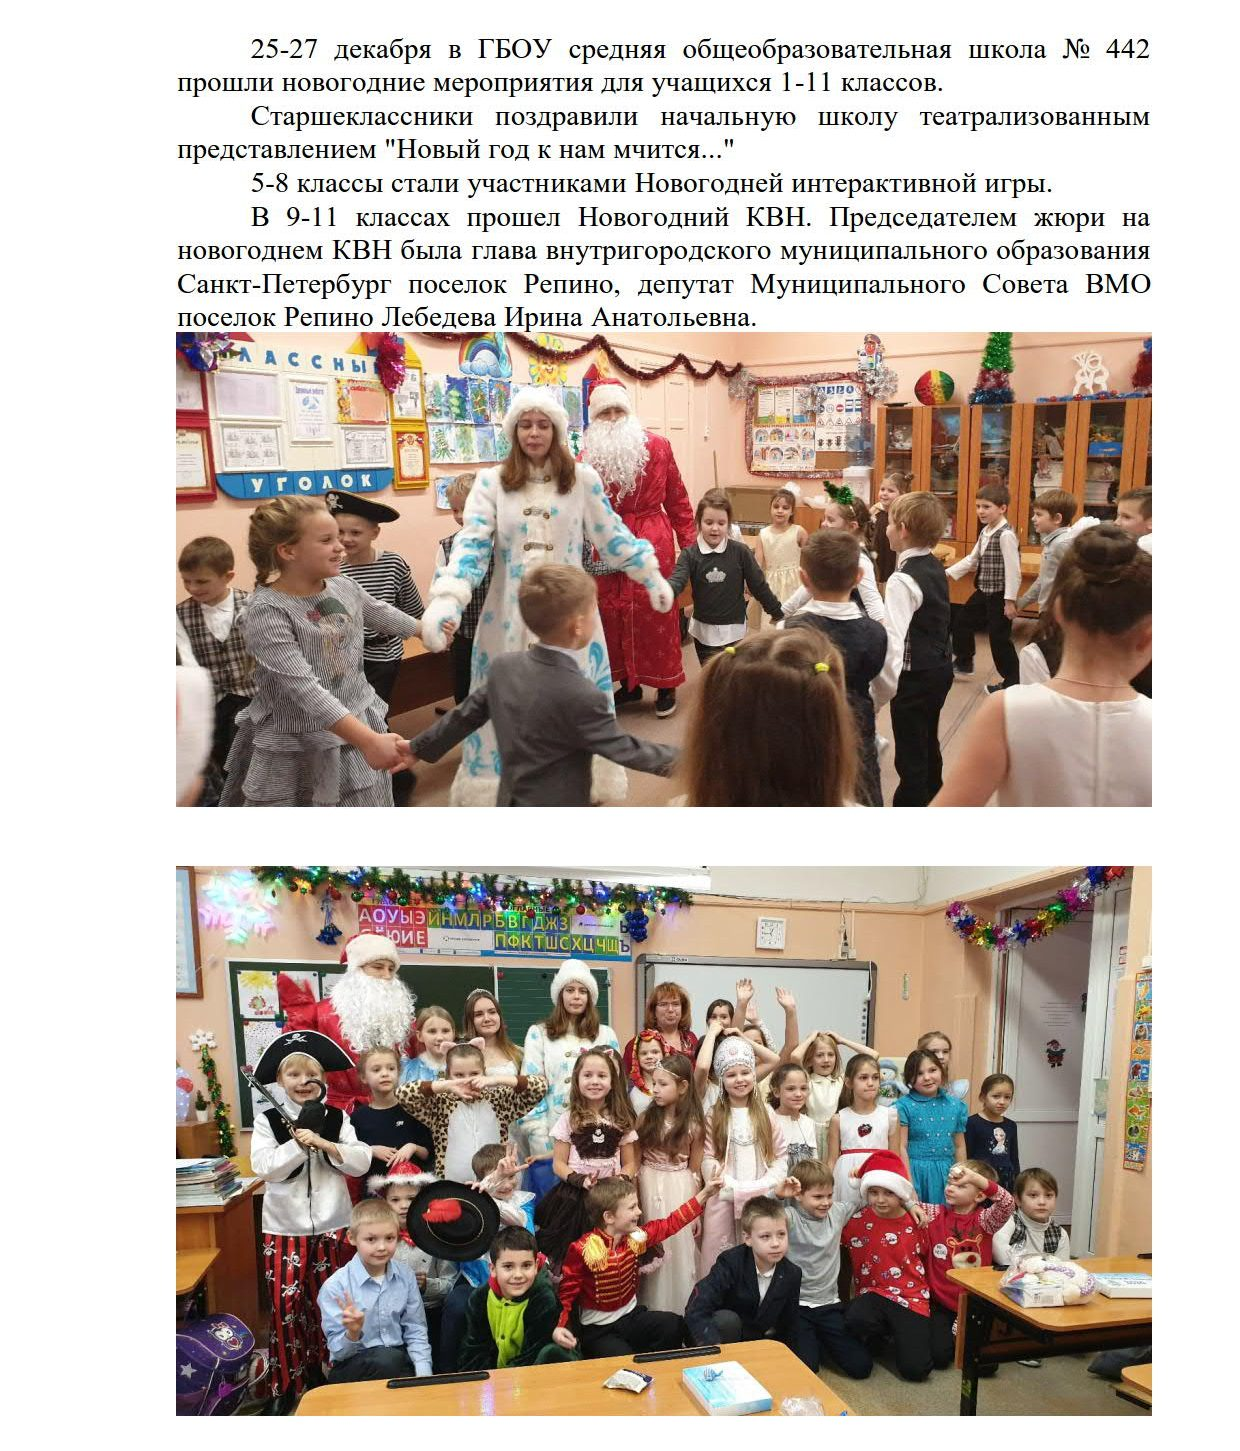 Новогодний фейерверк в ГБОУ СОШ 442_1